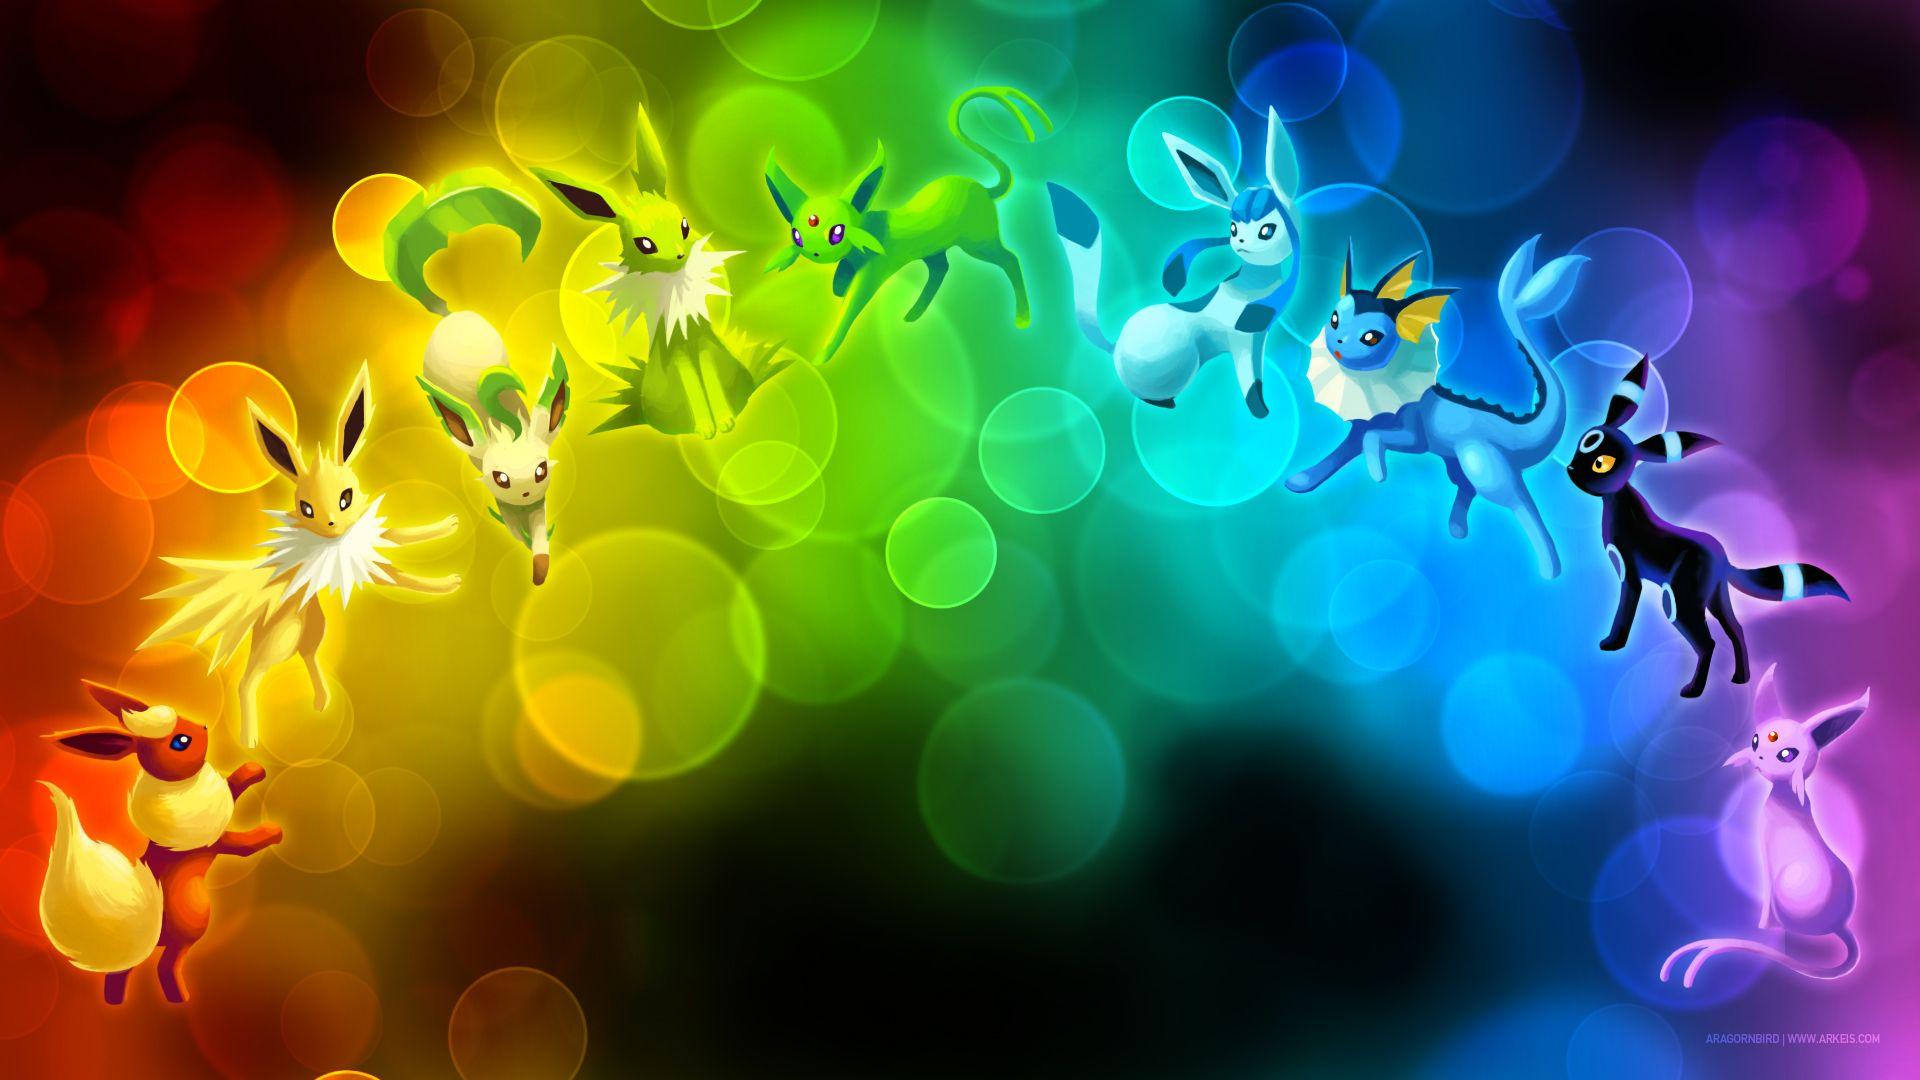 Wallpaper Eeveelution Rainbow By Arkeis Pokemon On Deviantart Eevee Wallpaper Pokemon Backgrounds Cute Pokemon Wallpaper